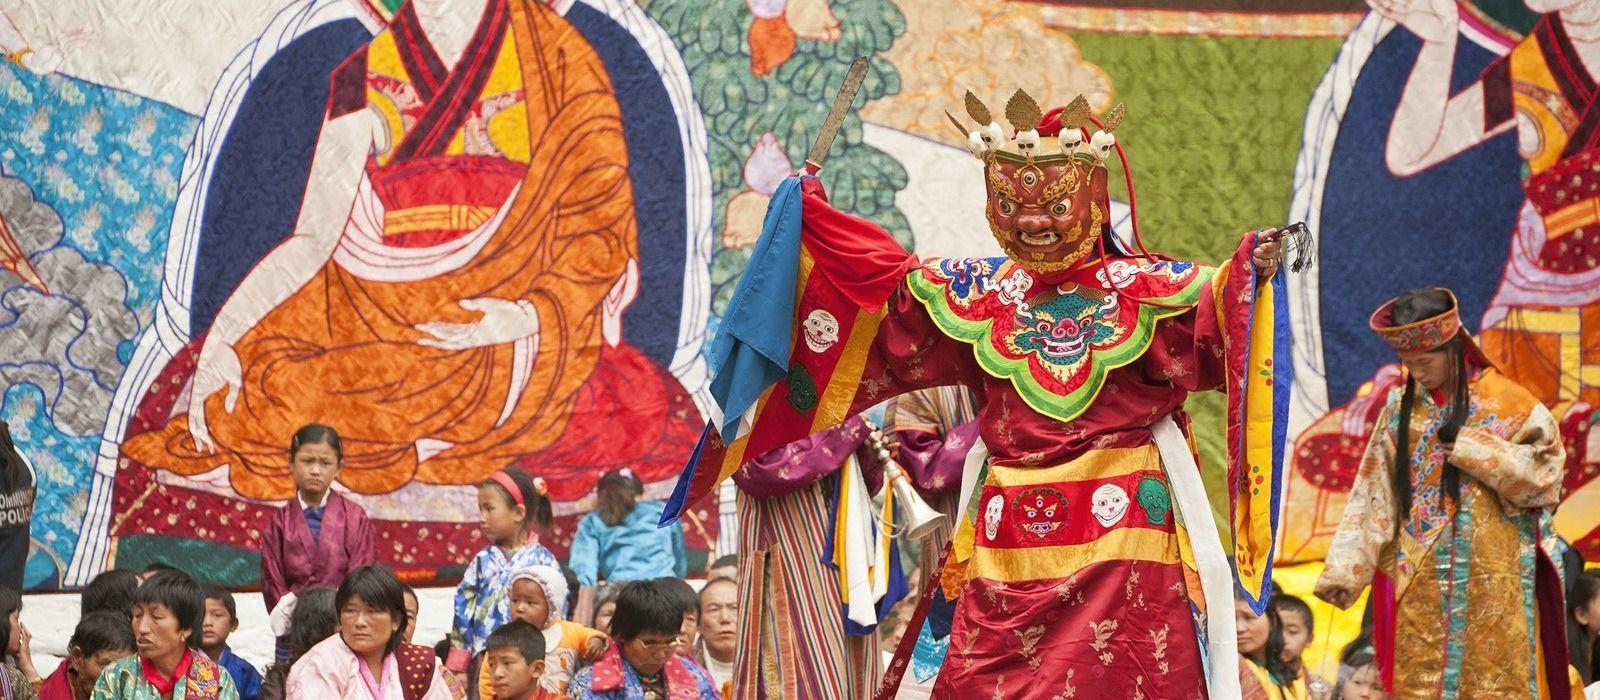 Nepalreise: Paläste, Tiger und Himalaya Urlaub 3